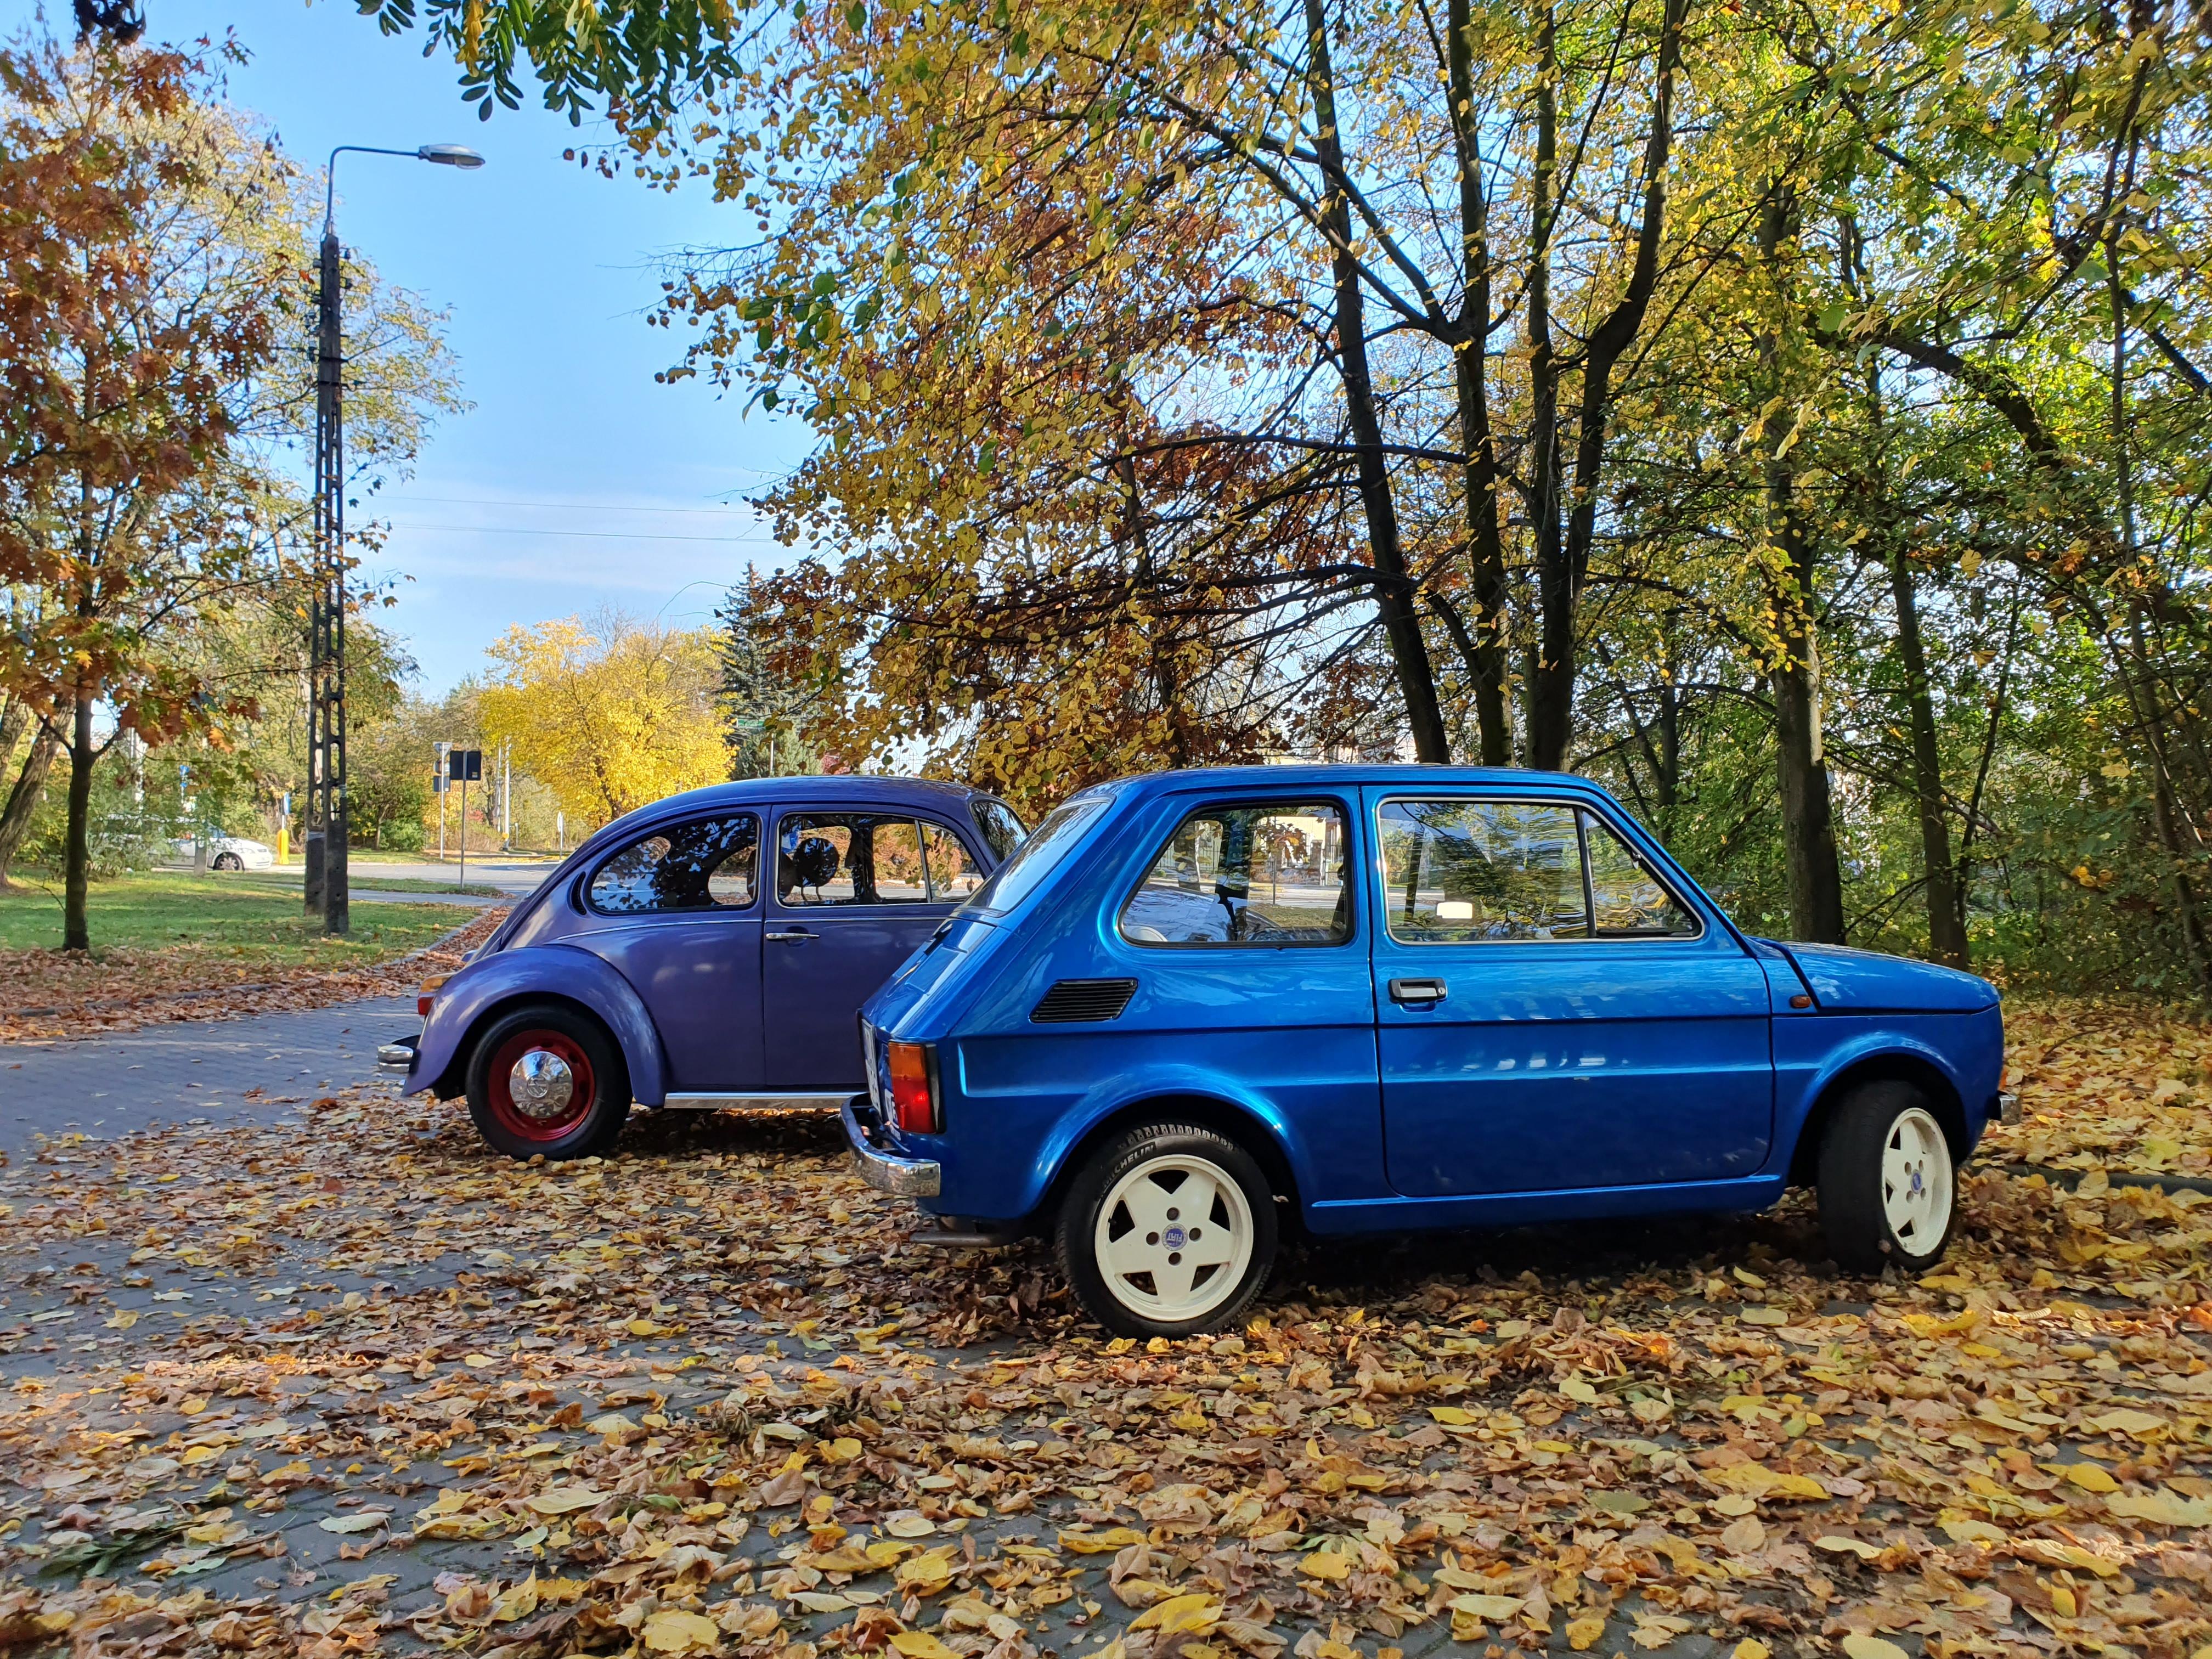 Jesien_2019_Fiat_126p_Garbus_4